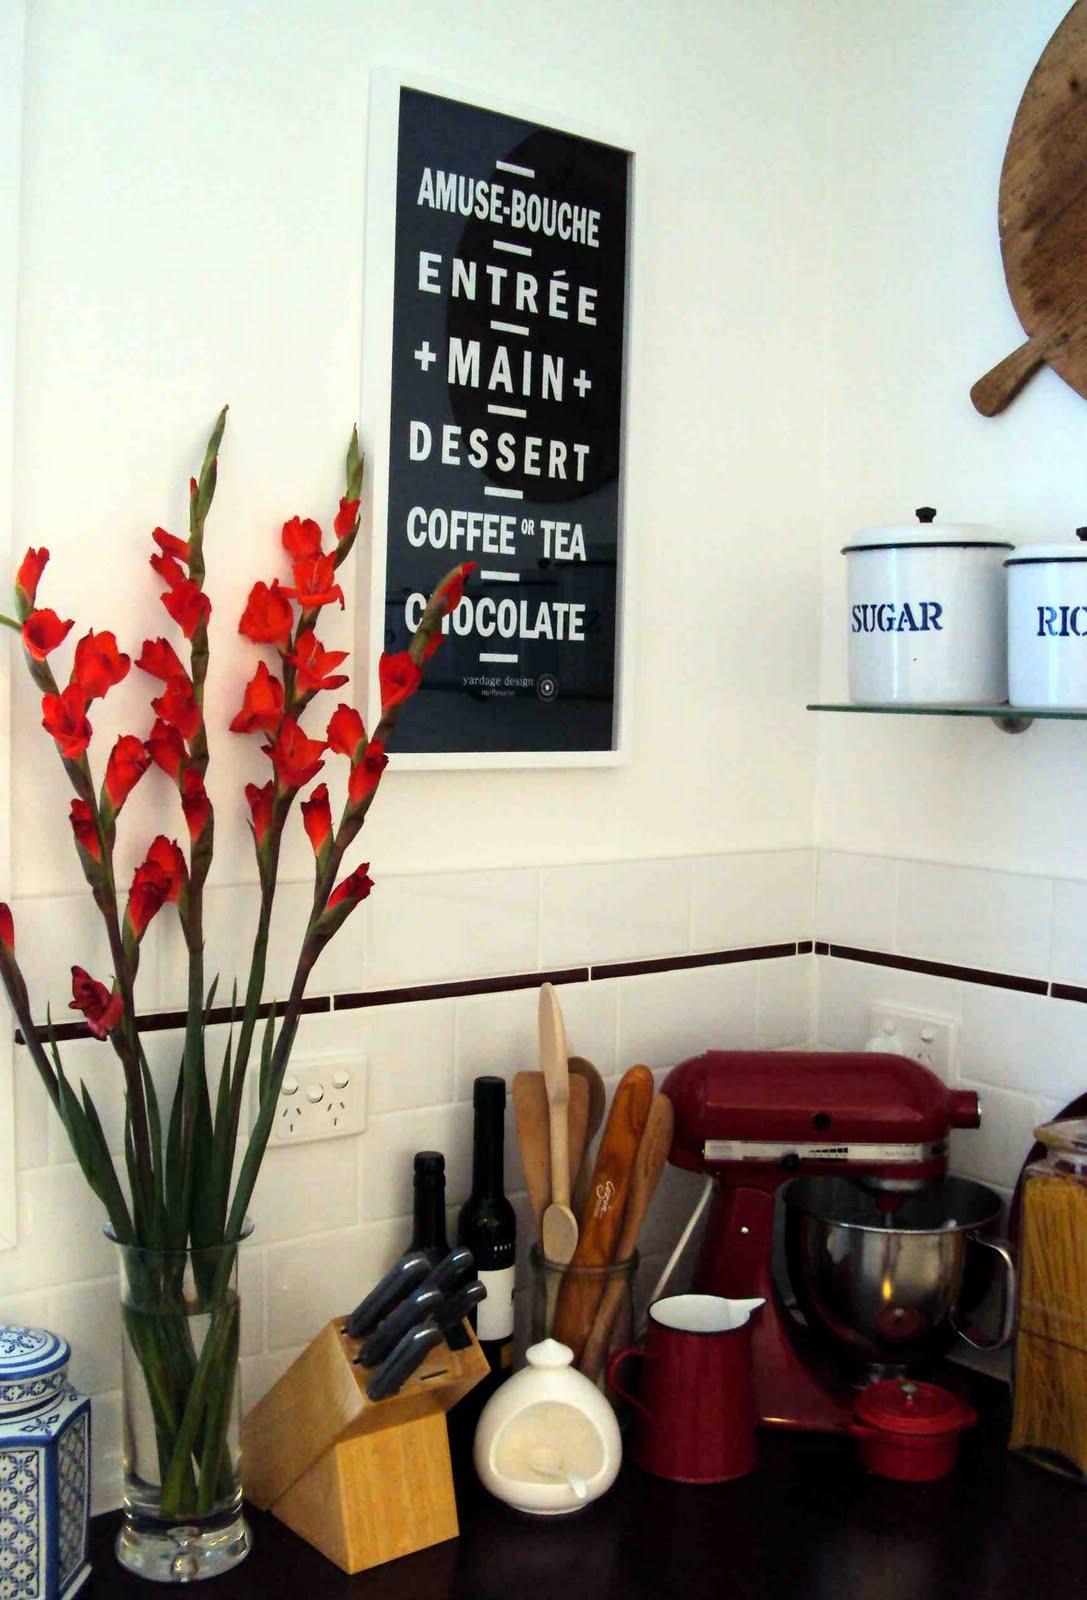 http://1.bp.blogspot.com/_NjcVQsF1eIo/THip90tvERI/AAAAAAAABe8/TqBa5Z83hSA/s1600/Yardage+Design+FK+2+-+kitchen+art.jpg